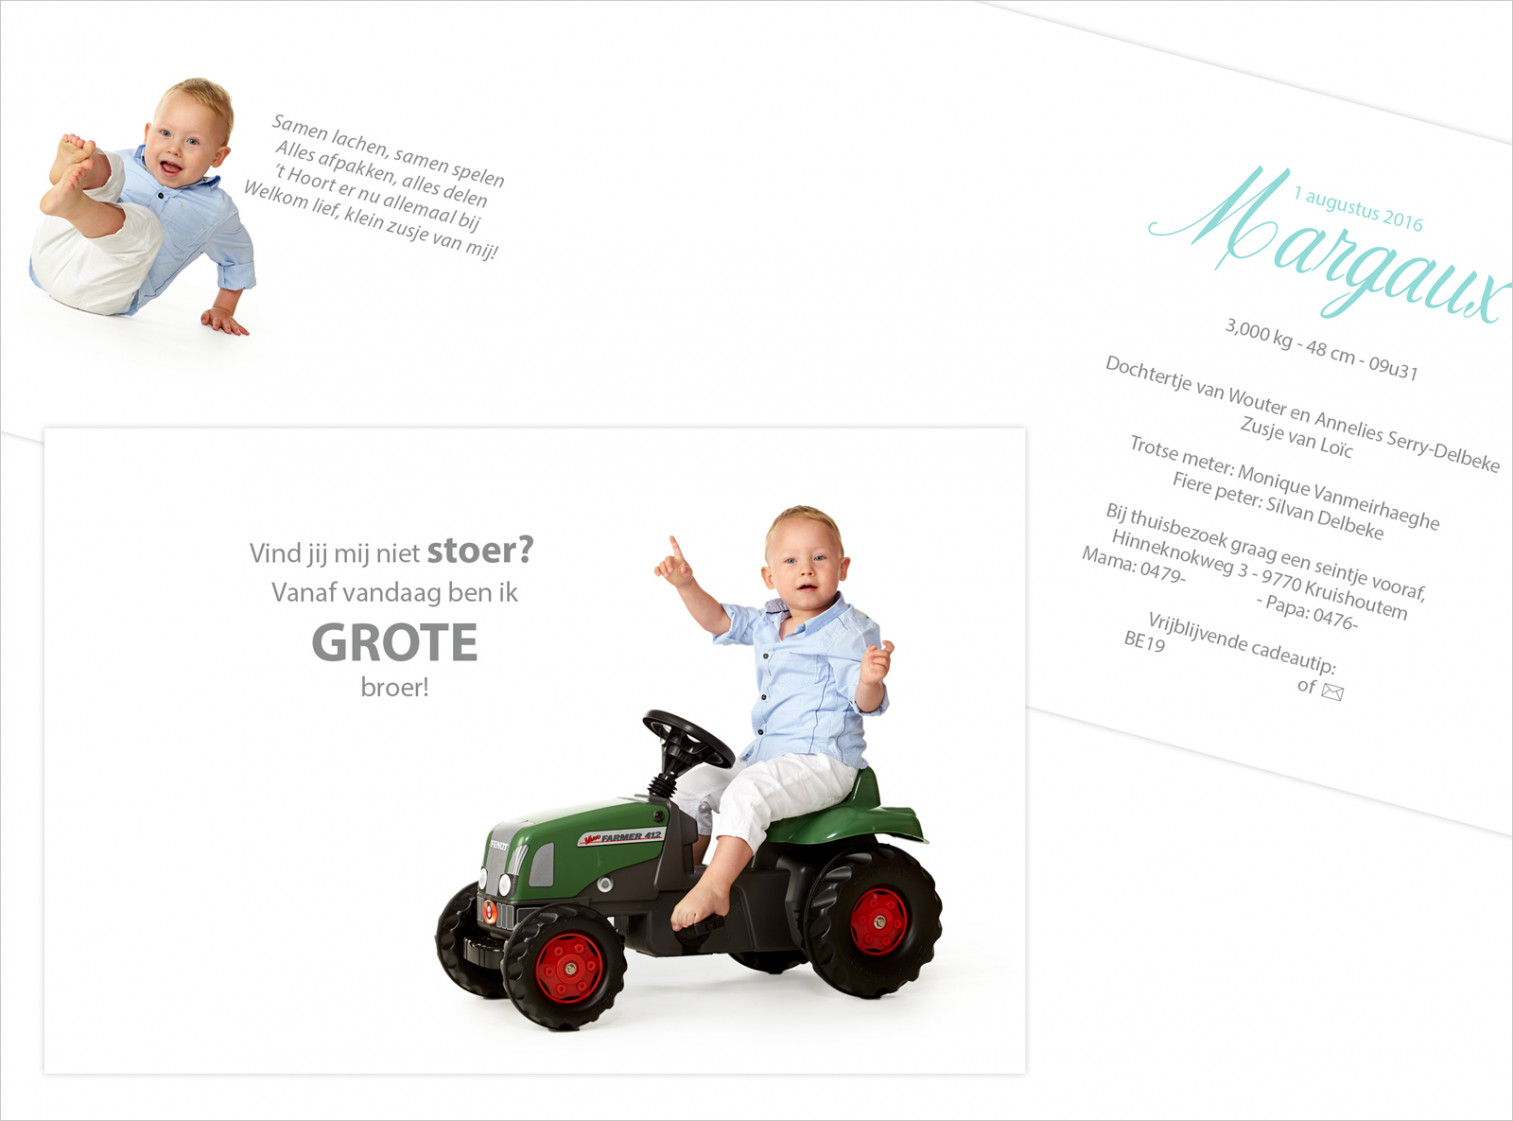 Geboortekaartje met foto van Margaux